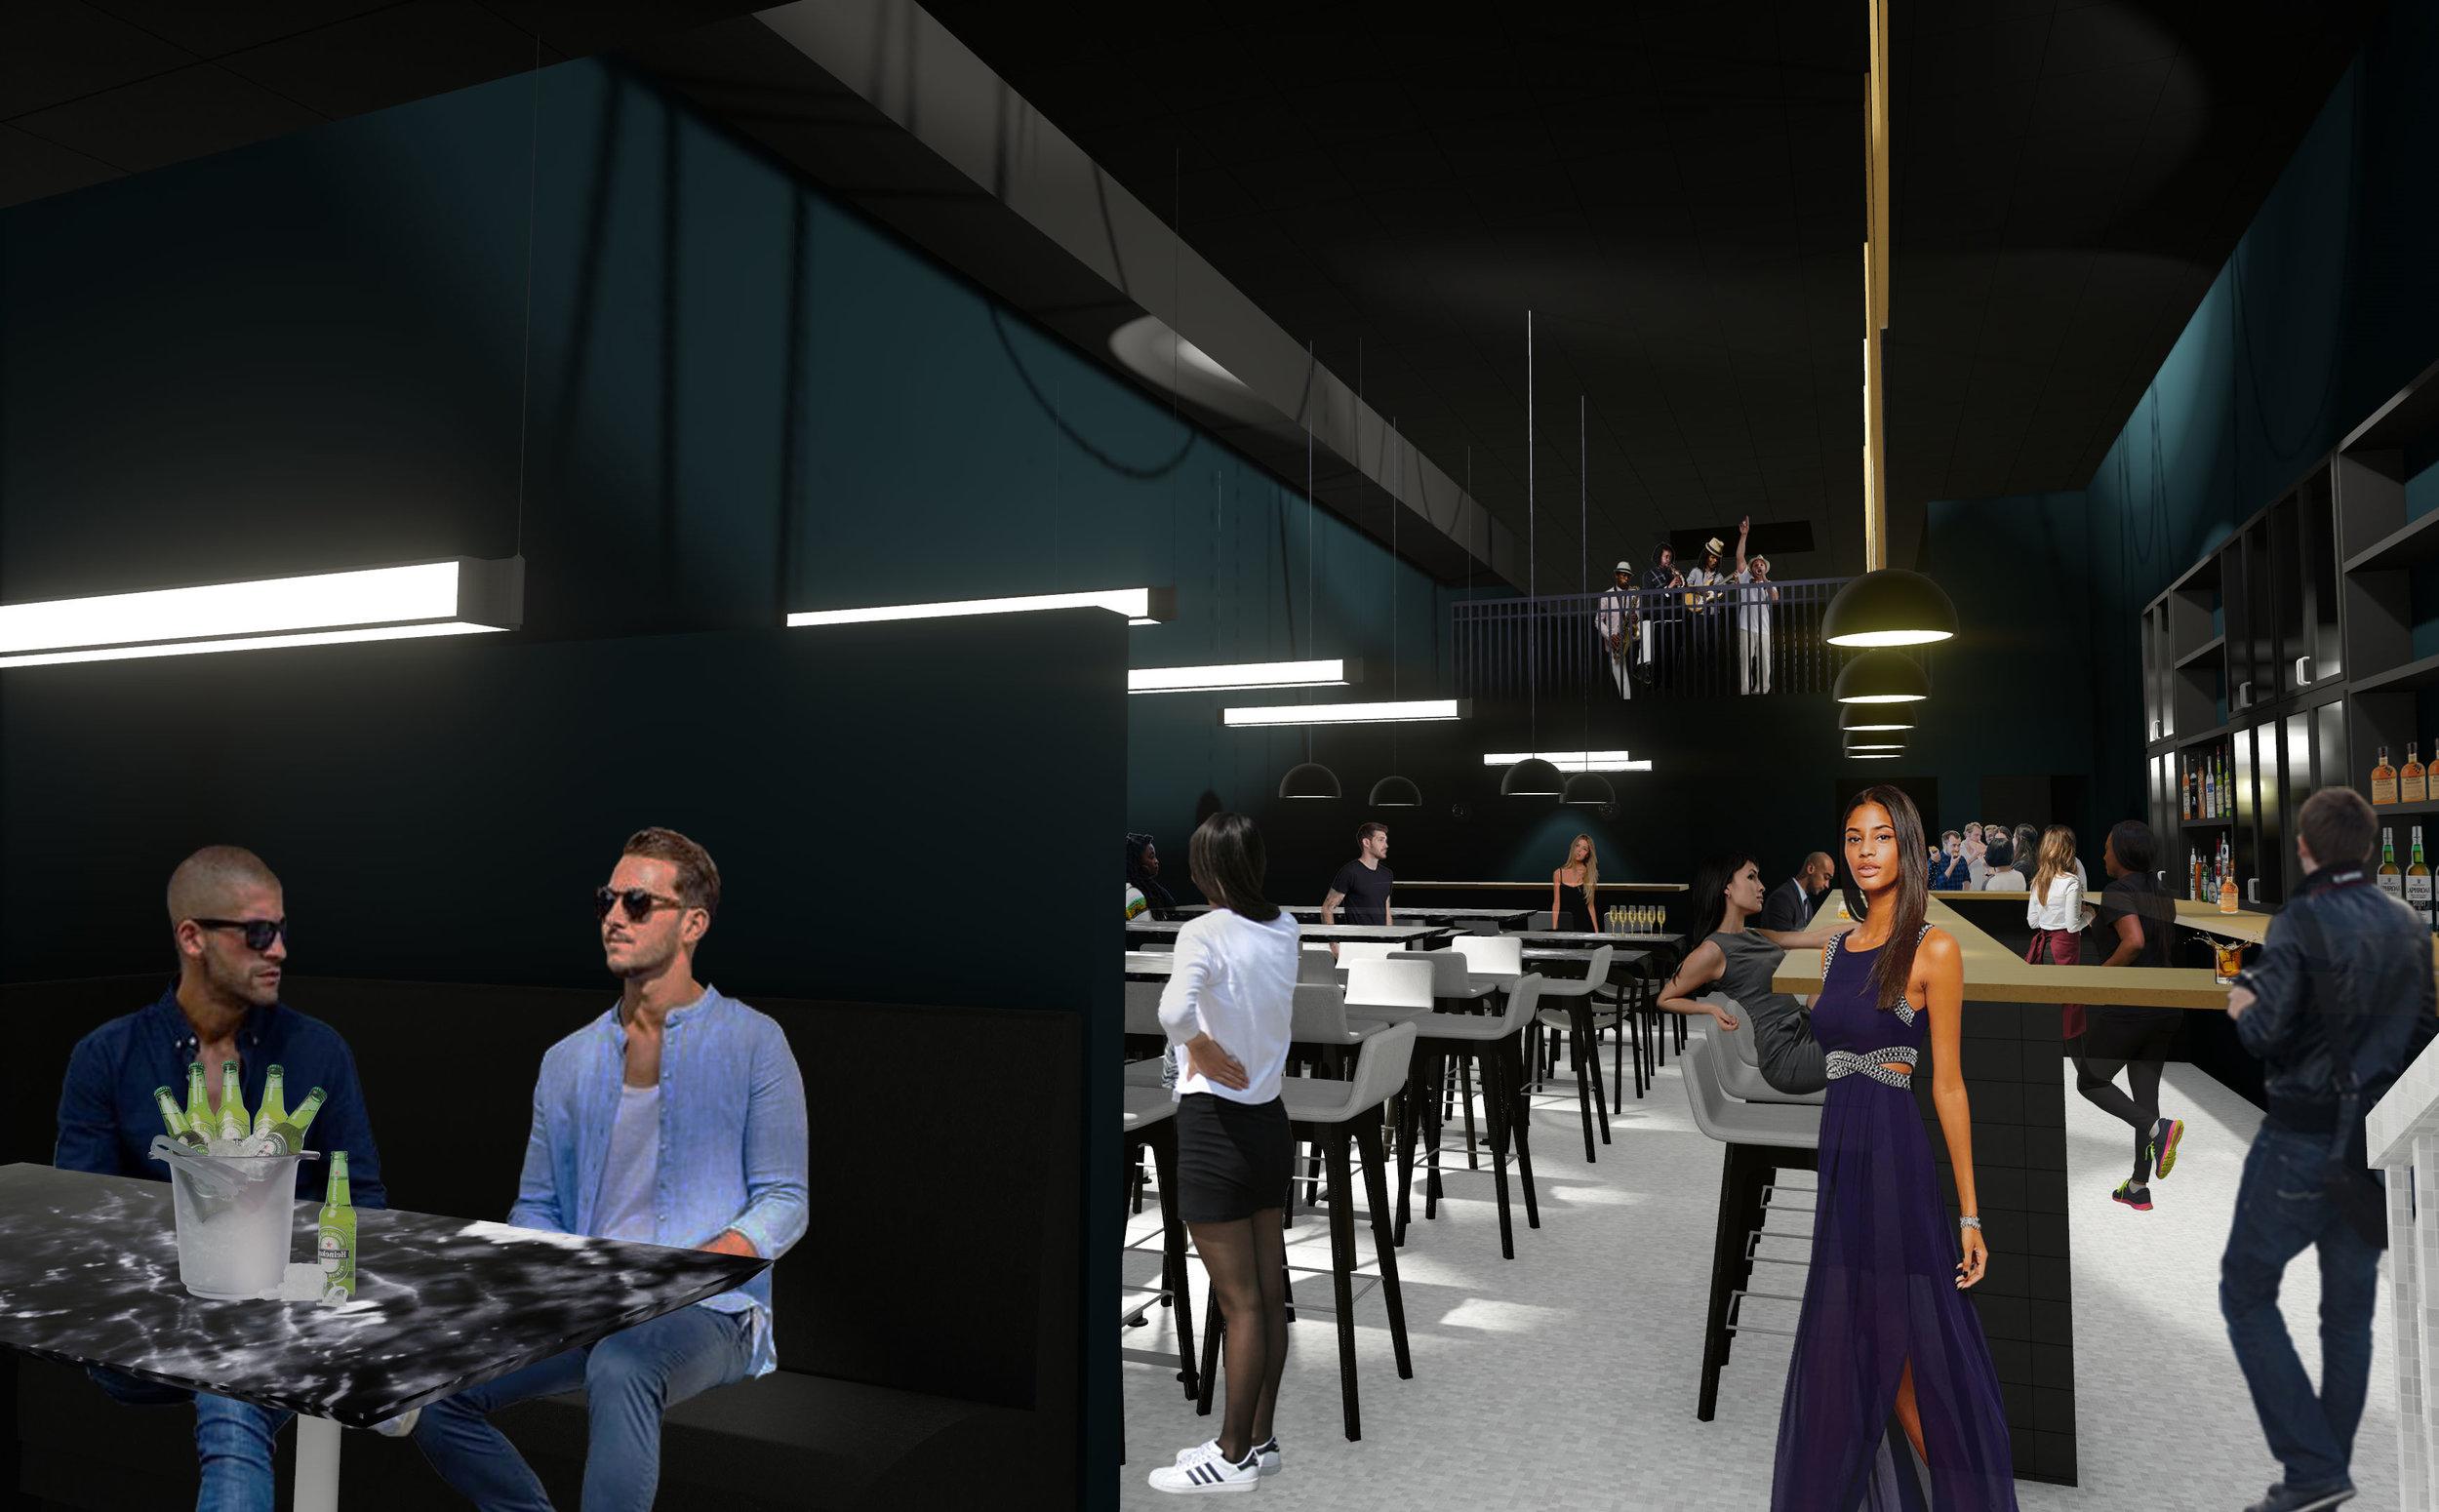 Tall Architects - Unlisted Speakeasy - Jackson, MS